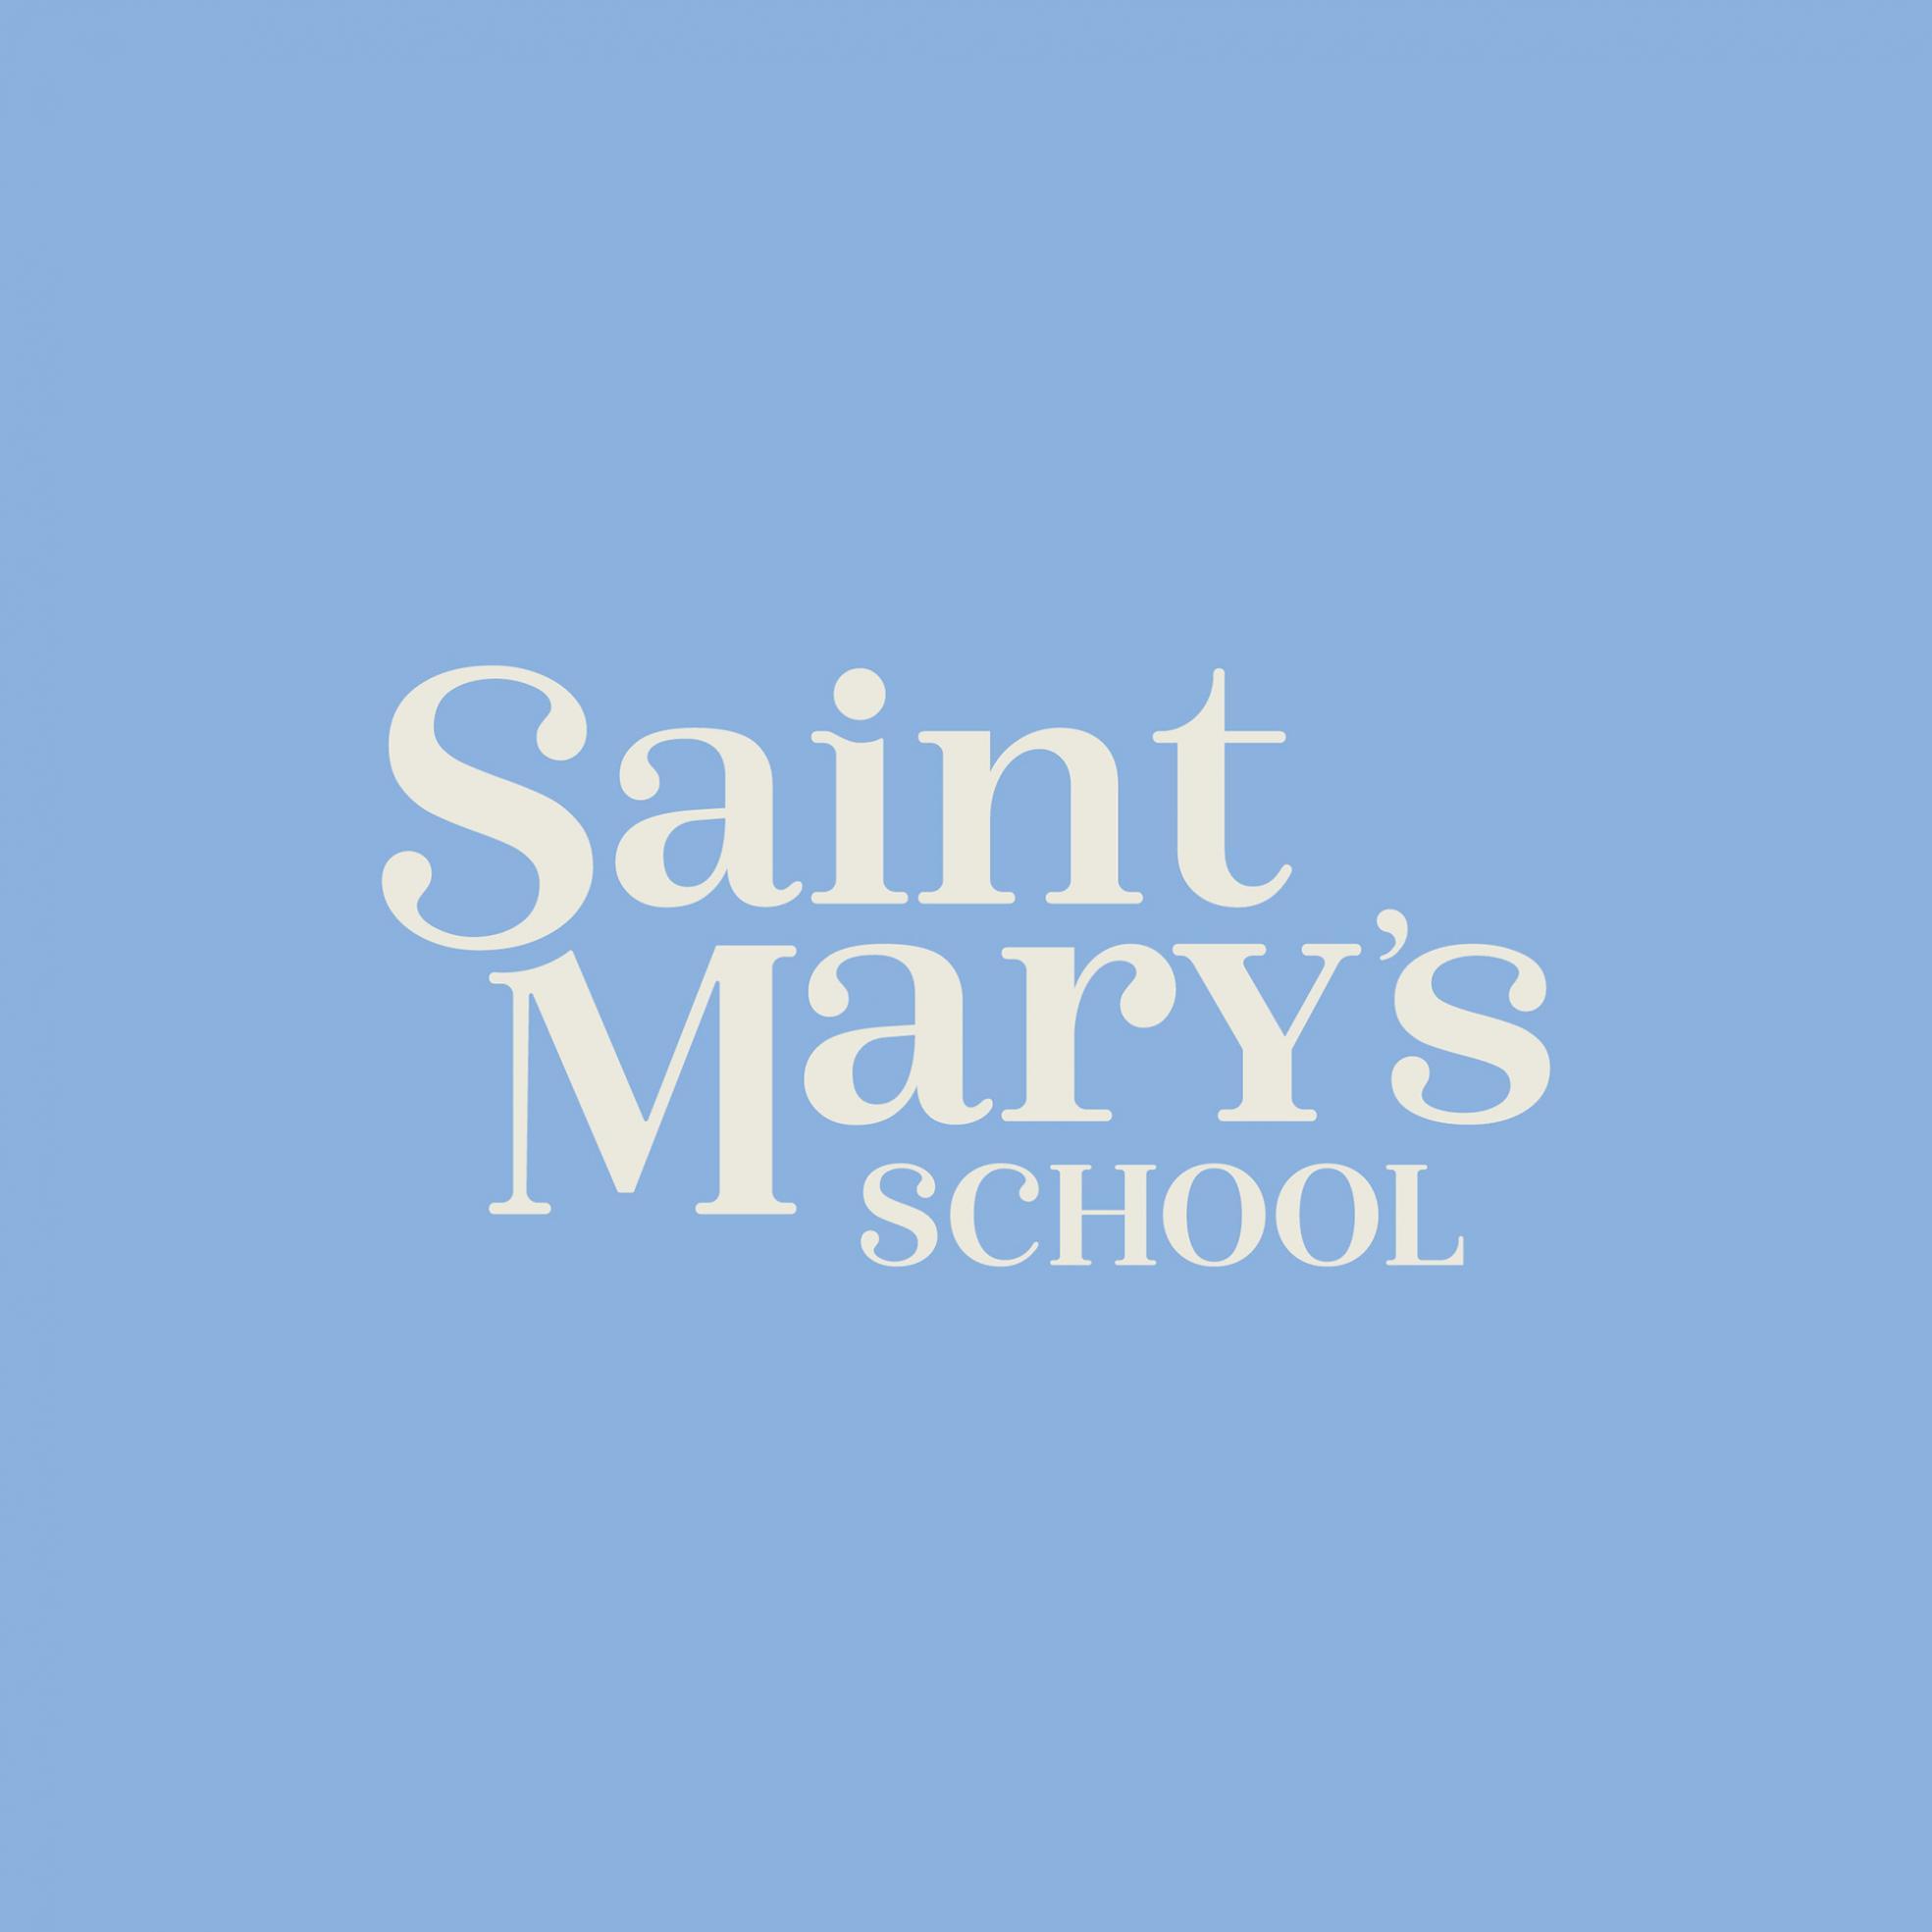 Saint Mary's School, Raleigh, N.C.